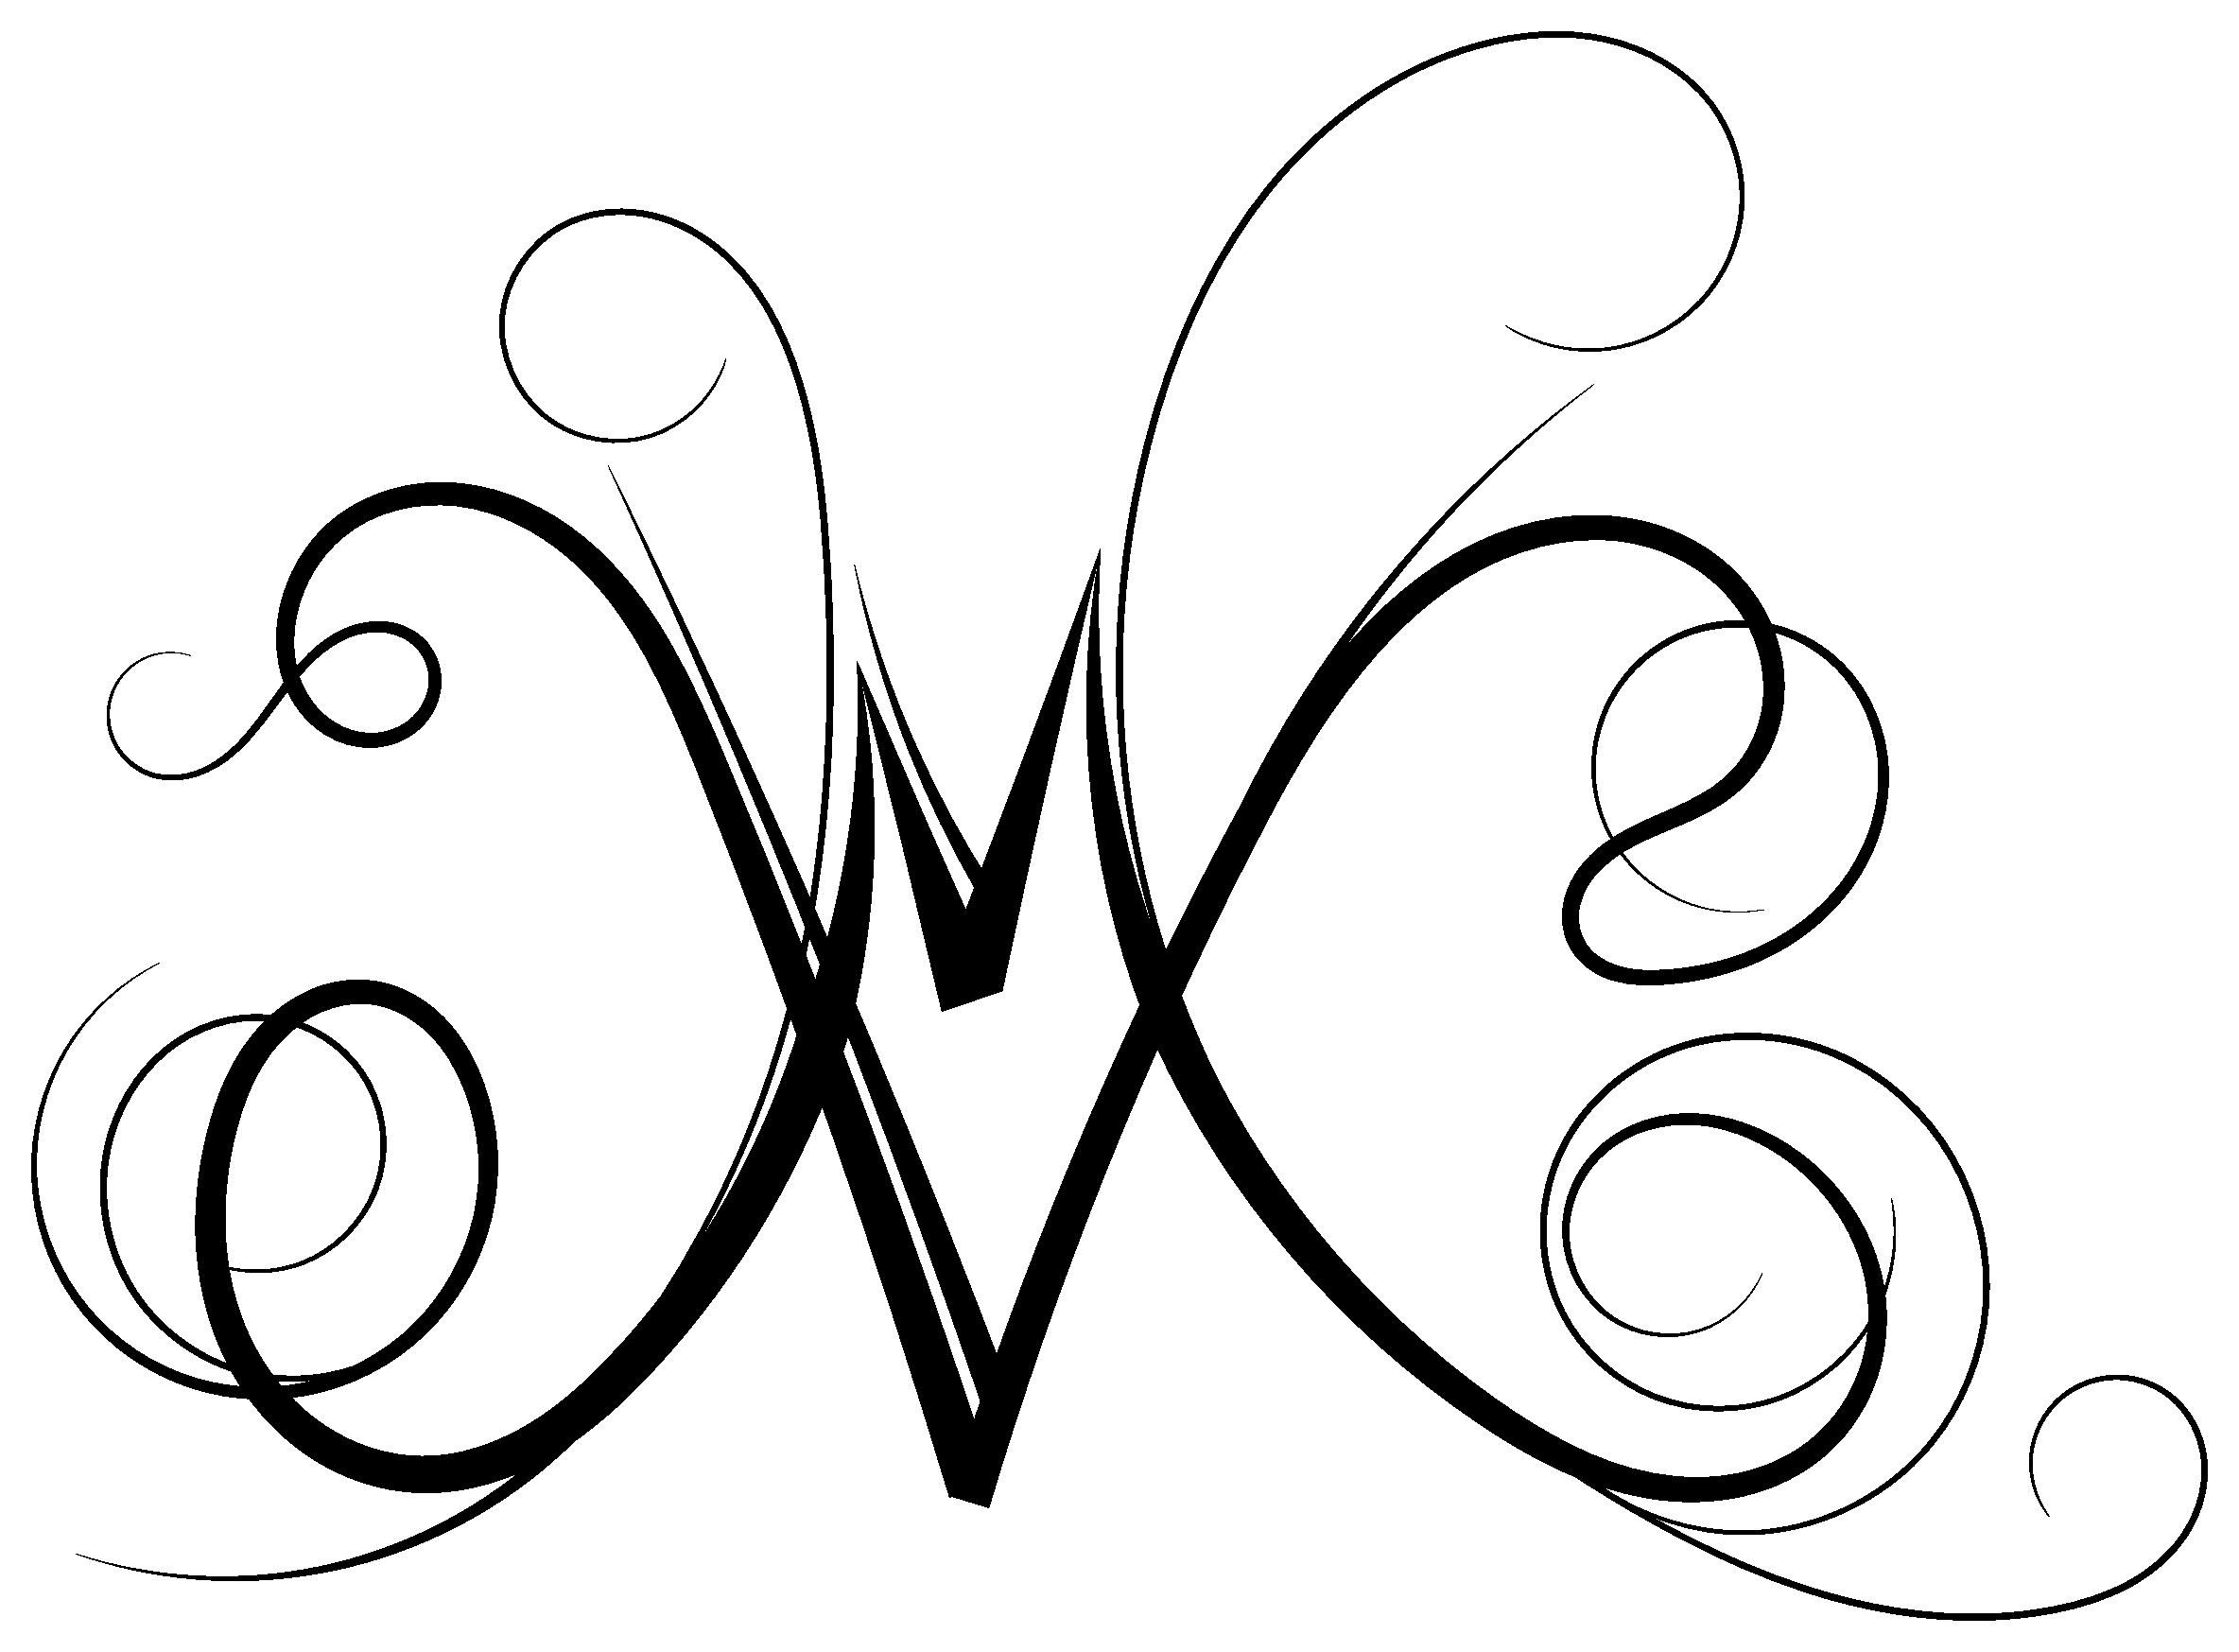 creation d un logo de mariage du carton invitation menu picture to pin on pinterest thepinsta. Black Bedroom Furniture Sets. Home Design Ideas